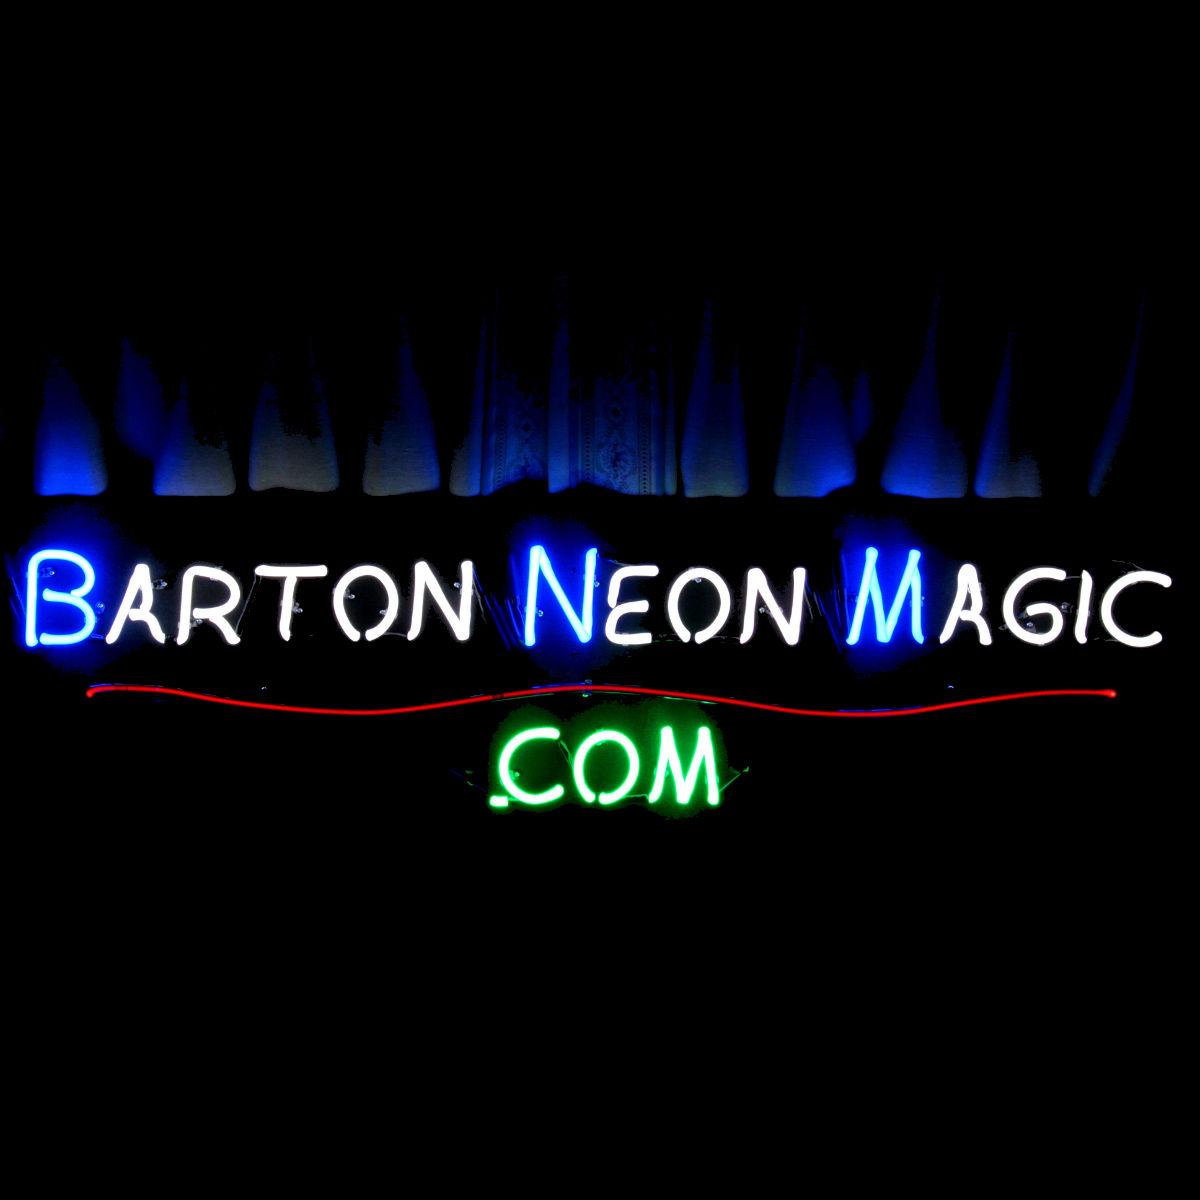 Custom Neon Lighting by BartonNeonMagic.com - John Barton - Famous USA Neon Light Sculptor